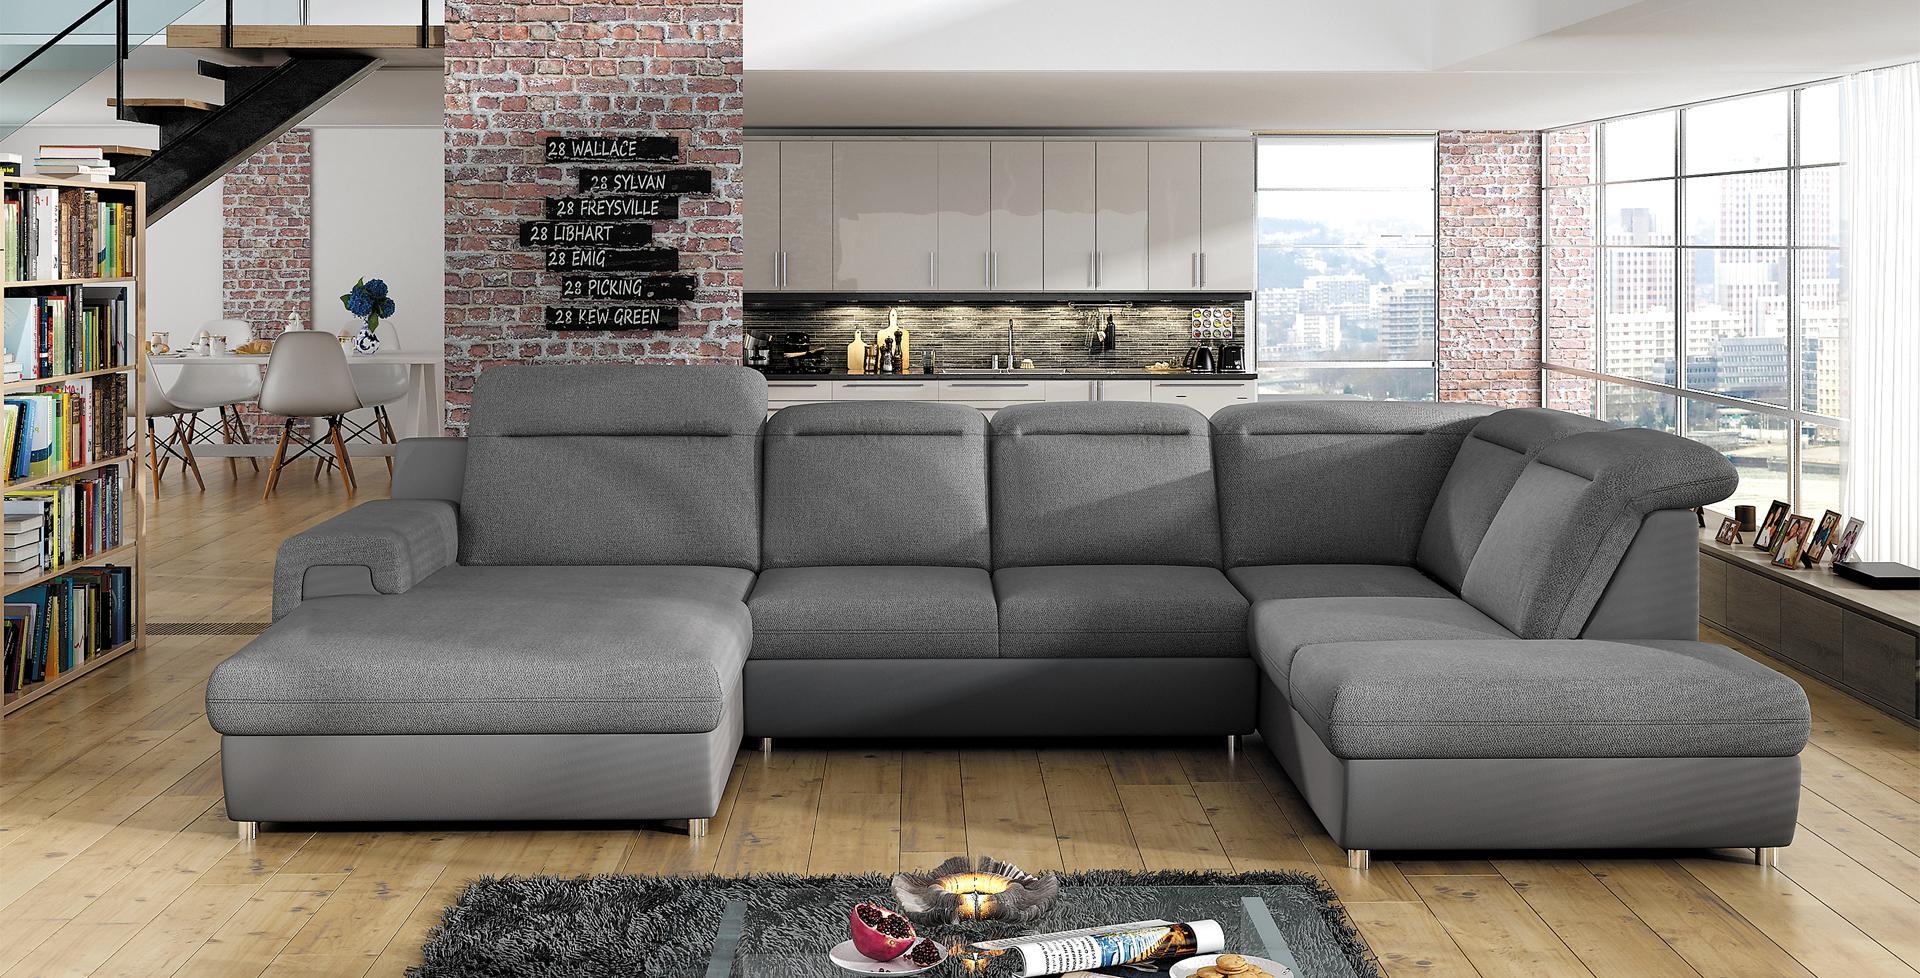 sofa schlafsofa wohnlandschaft mit bettfunktion bettkasten ecksofa u couch neu panama xl www. Black Bedroom Furniture Sets. Home Design Ideas